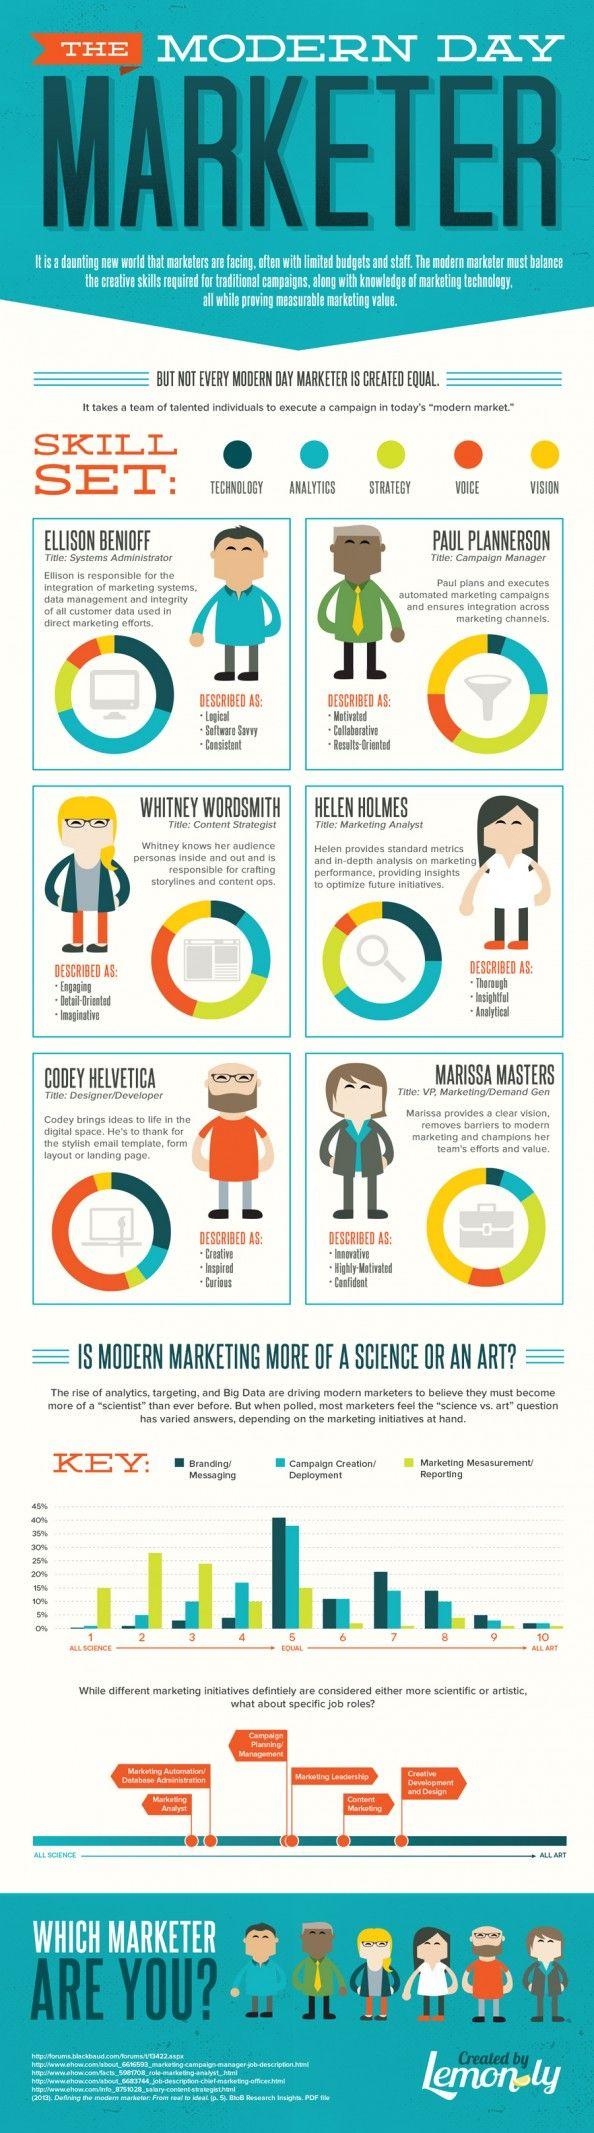 The Modern Day Marketer / O marketeiro moderno! #internet #marketing #emailmanager www.emailmanager.com